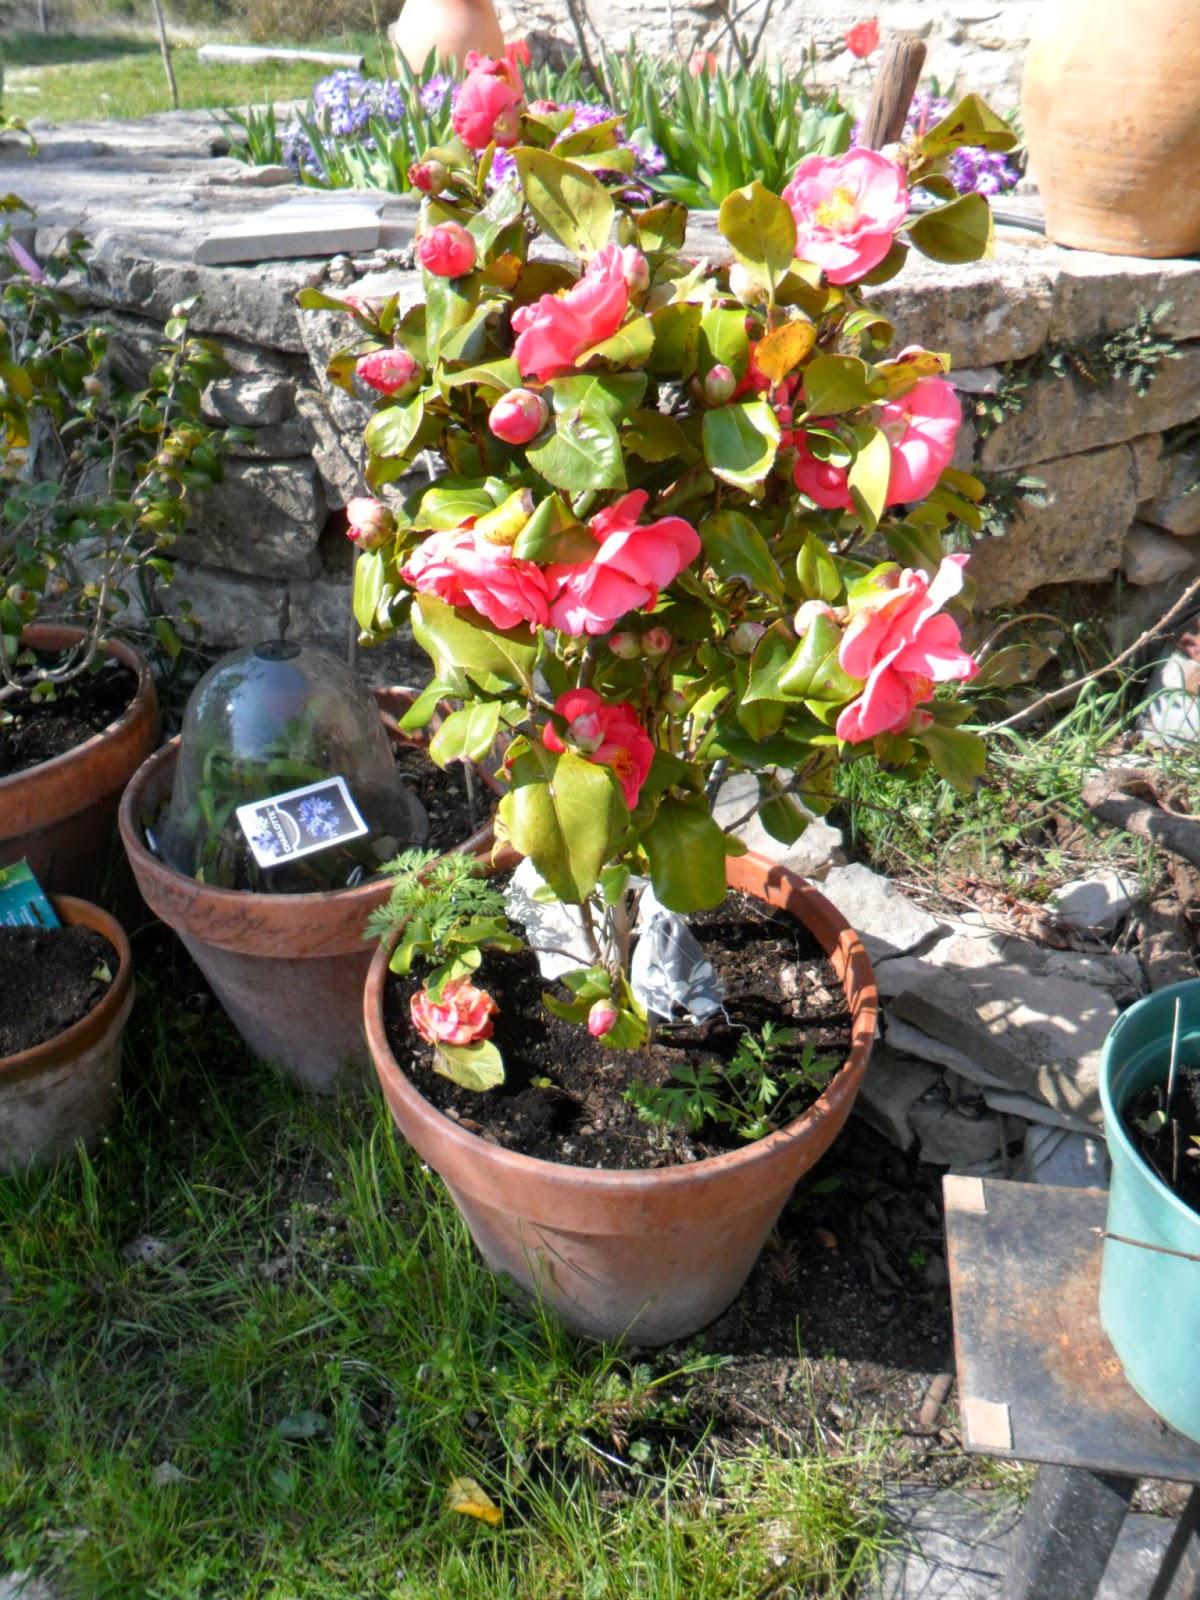 Le jardin de prosper mars 2015 for Jardin mars 2015